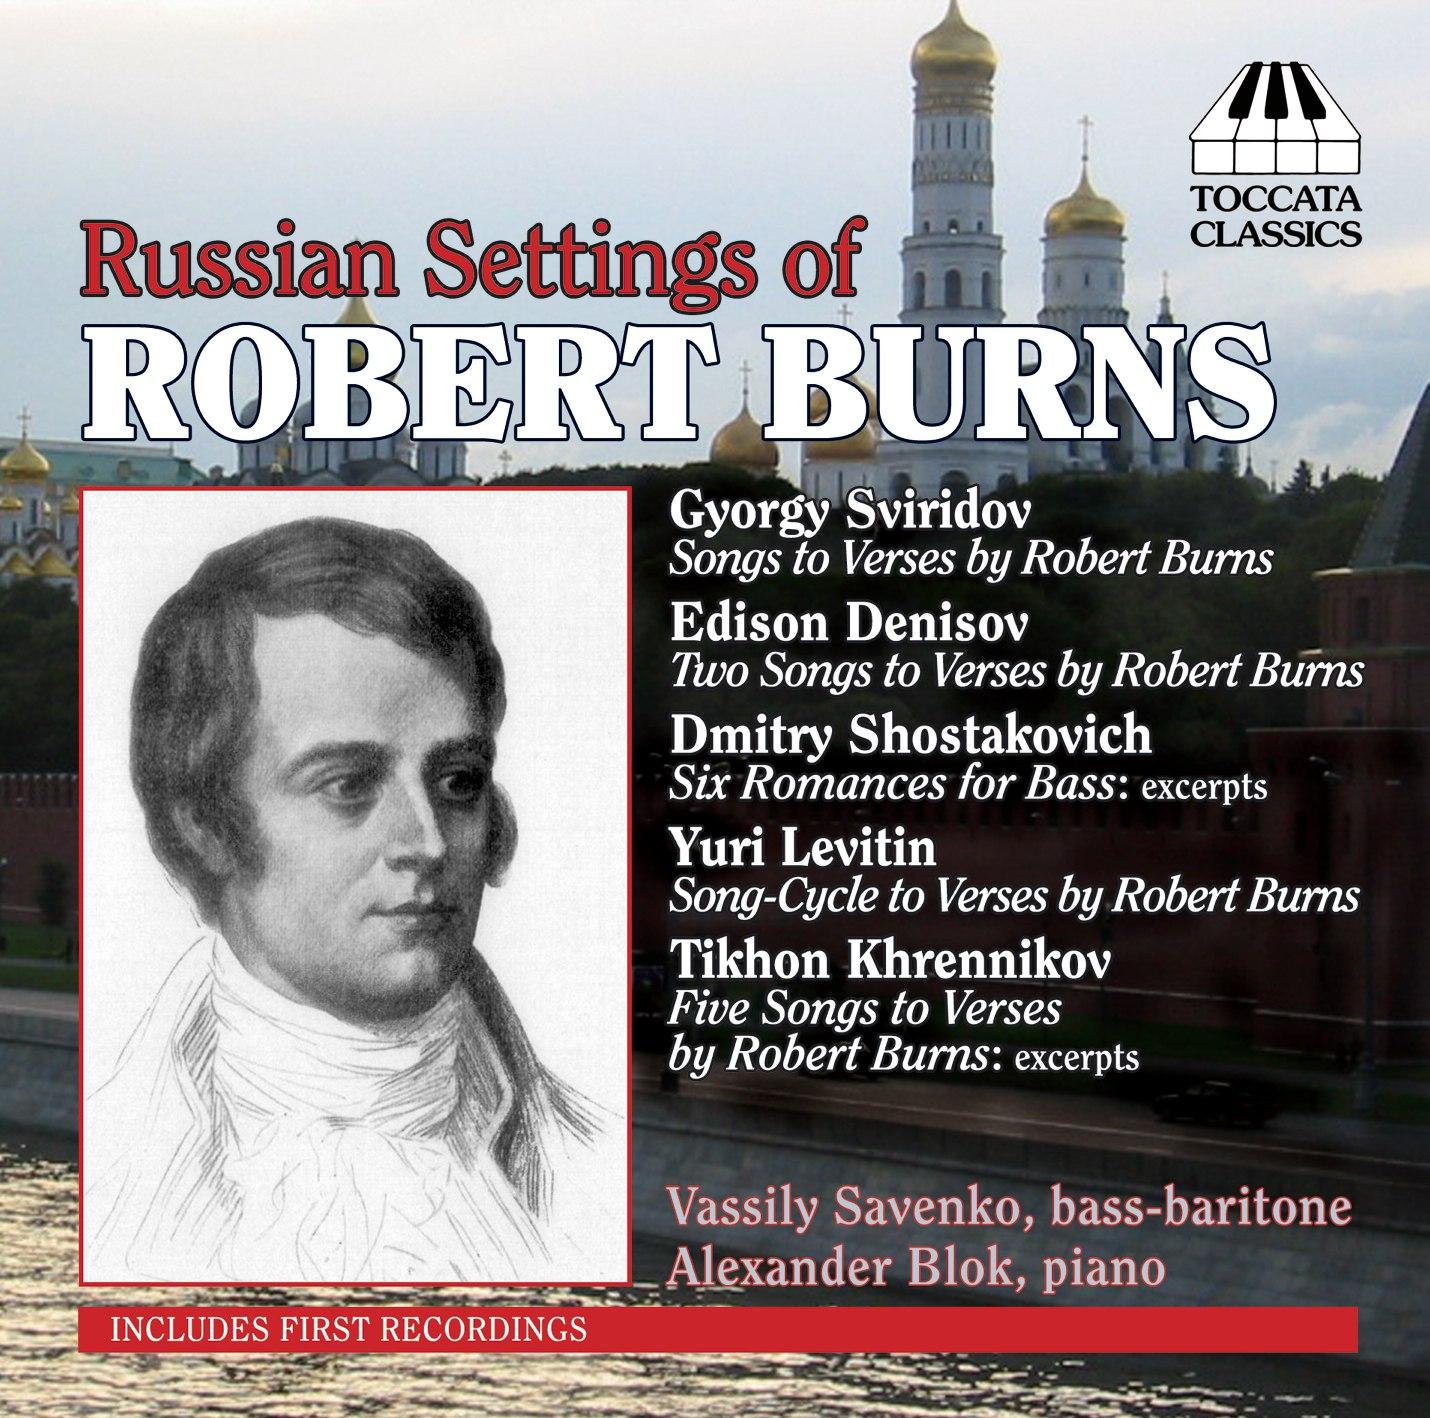 Russian Settings of Robert Burns